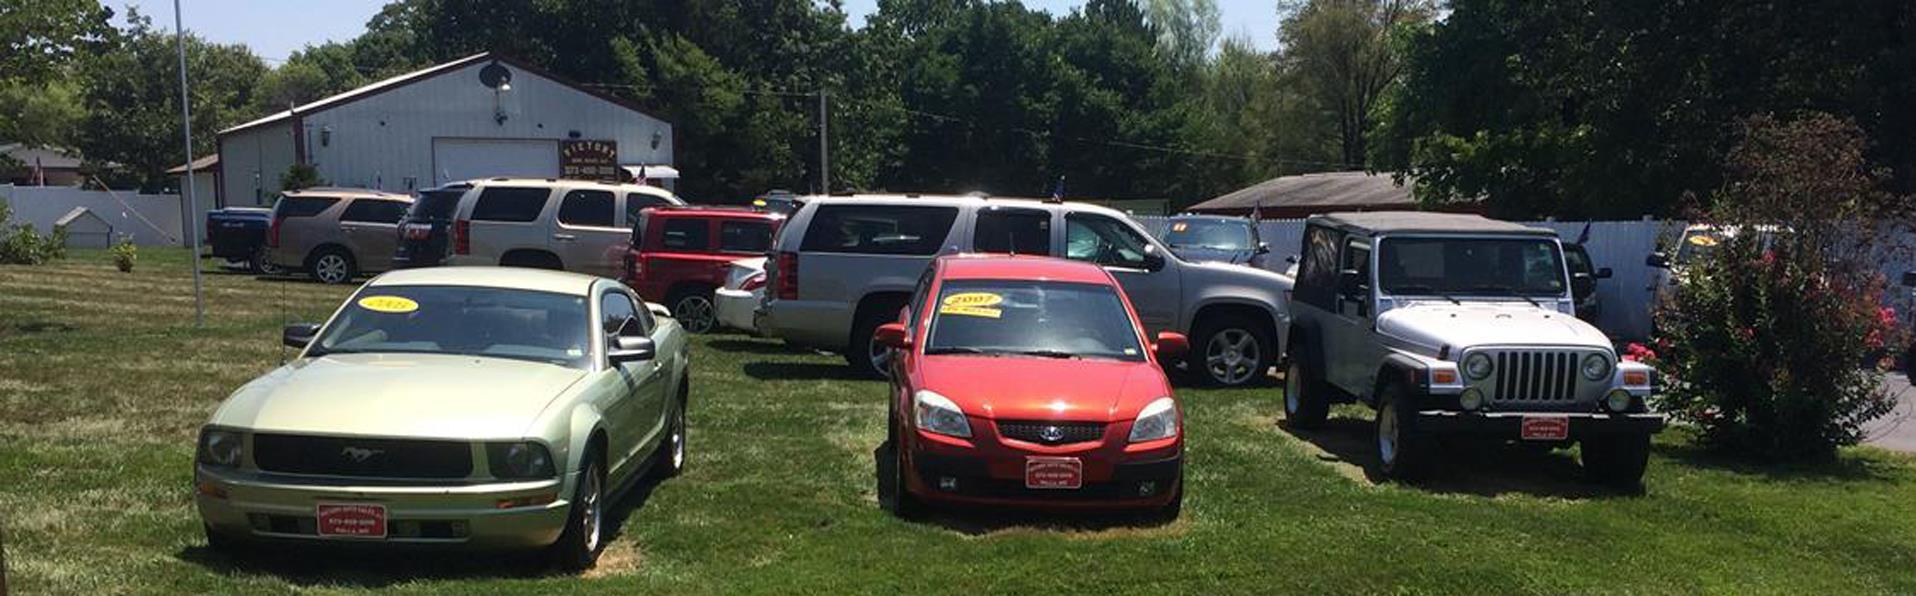 used cars rolla mo used cars trucks mo victory auto sales llc used cars rolla mo used cars trucks